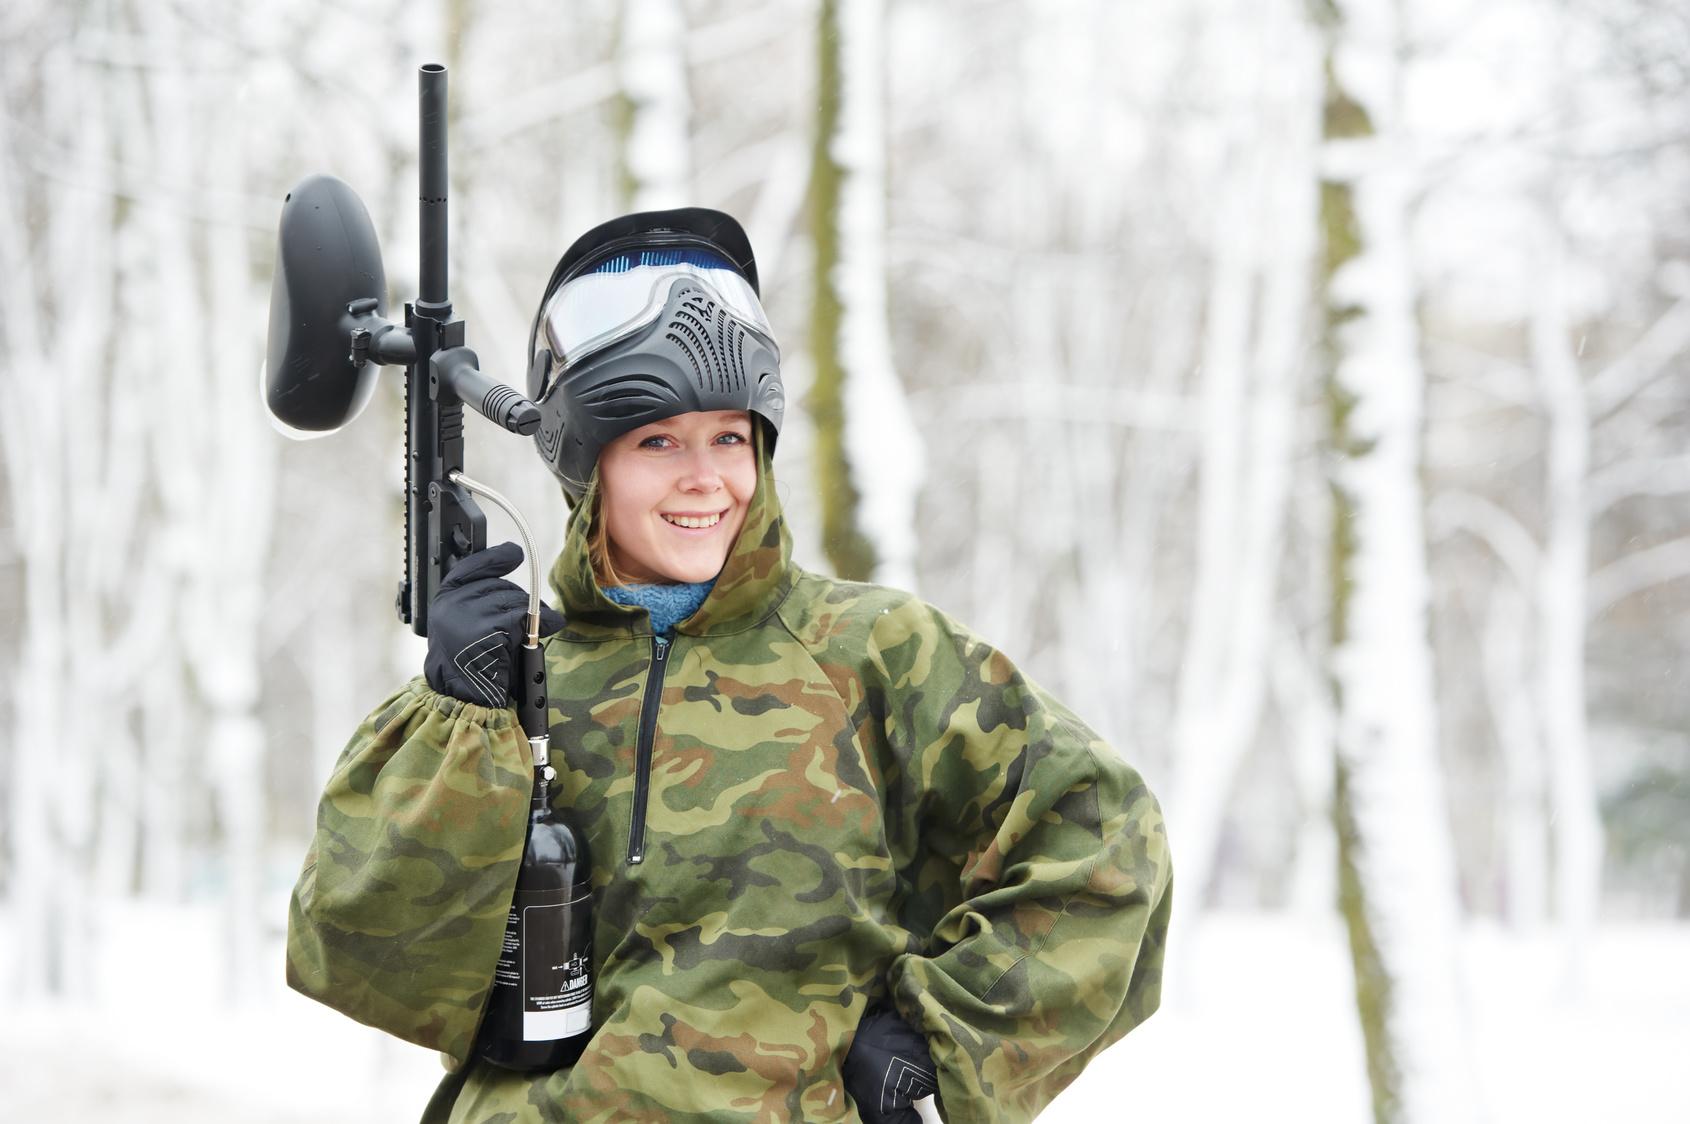 Zimowisko bez nart - zimowisko survivalowe